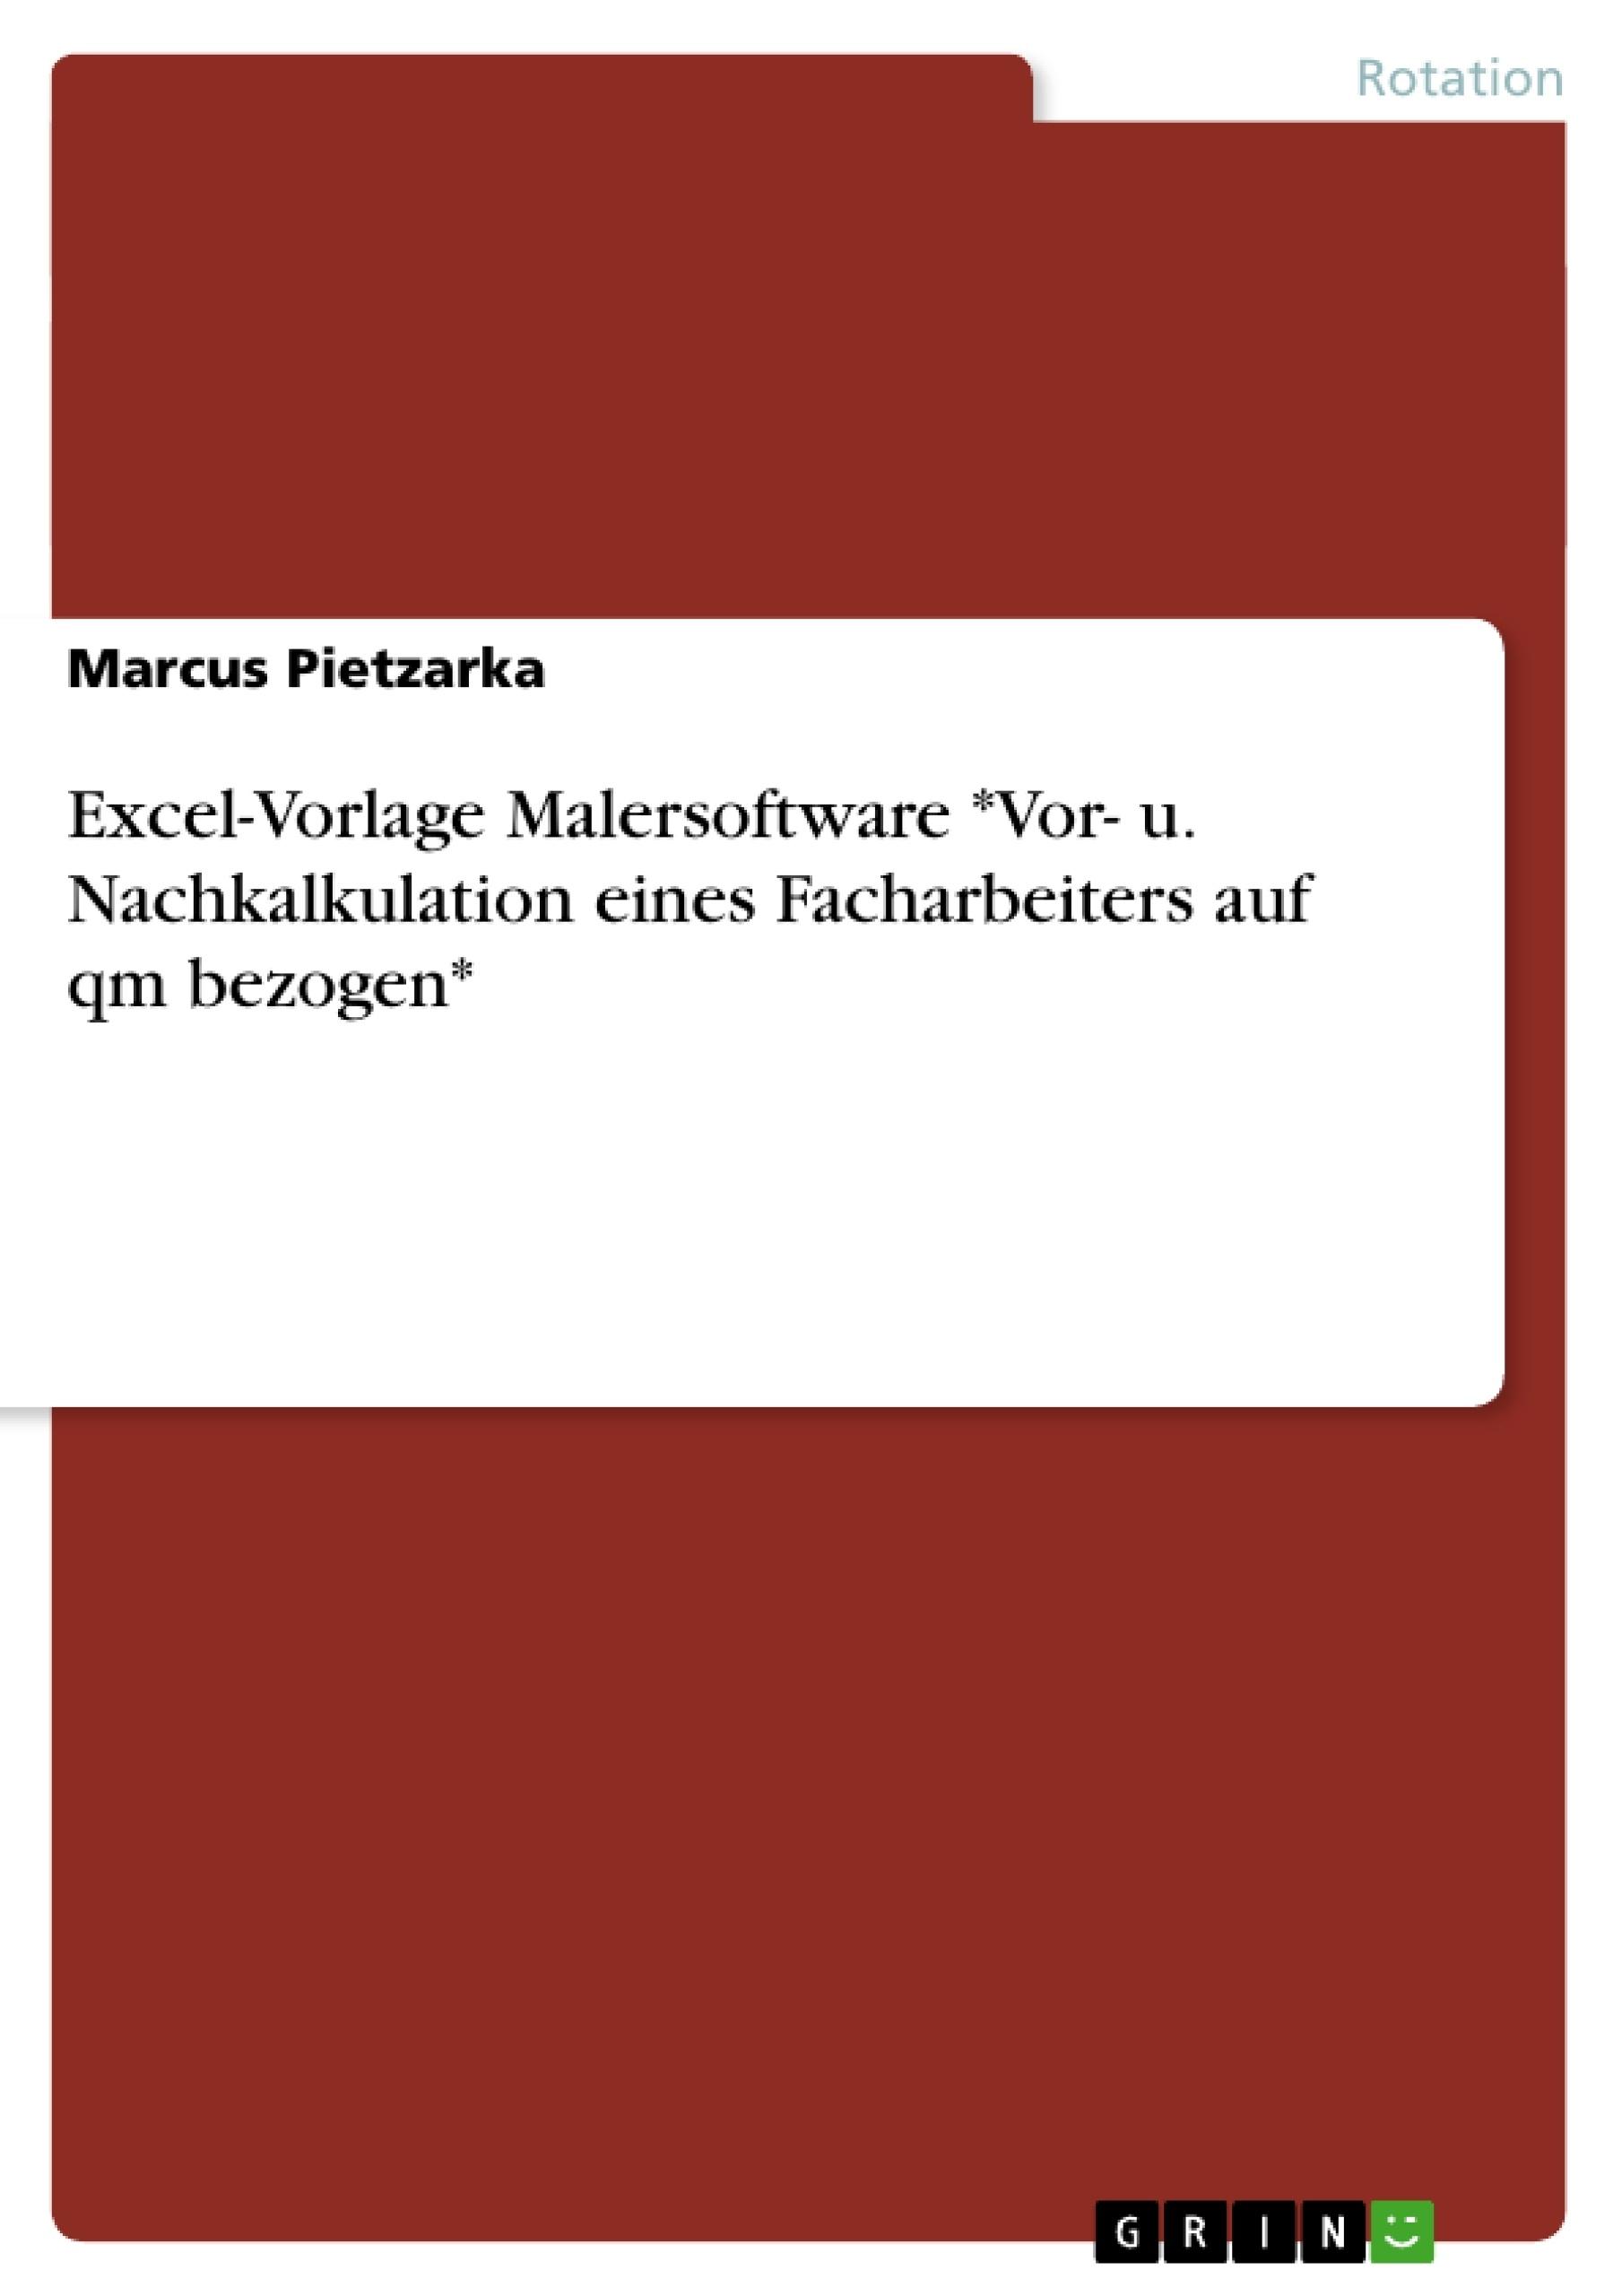 ebook electronic properties of fullerenes proceedings of the international winterschool on electronic properties of novel materials kirchberg tirol march 613 1993 1993